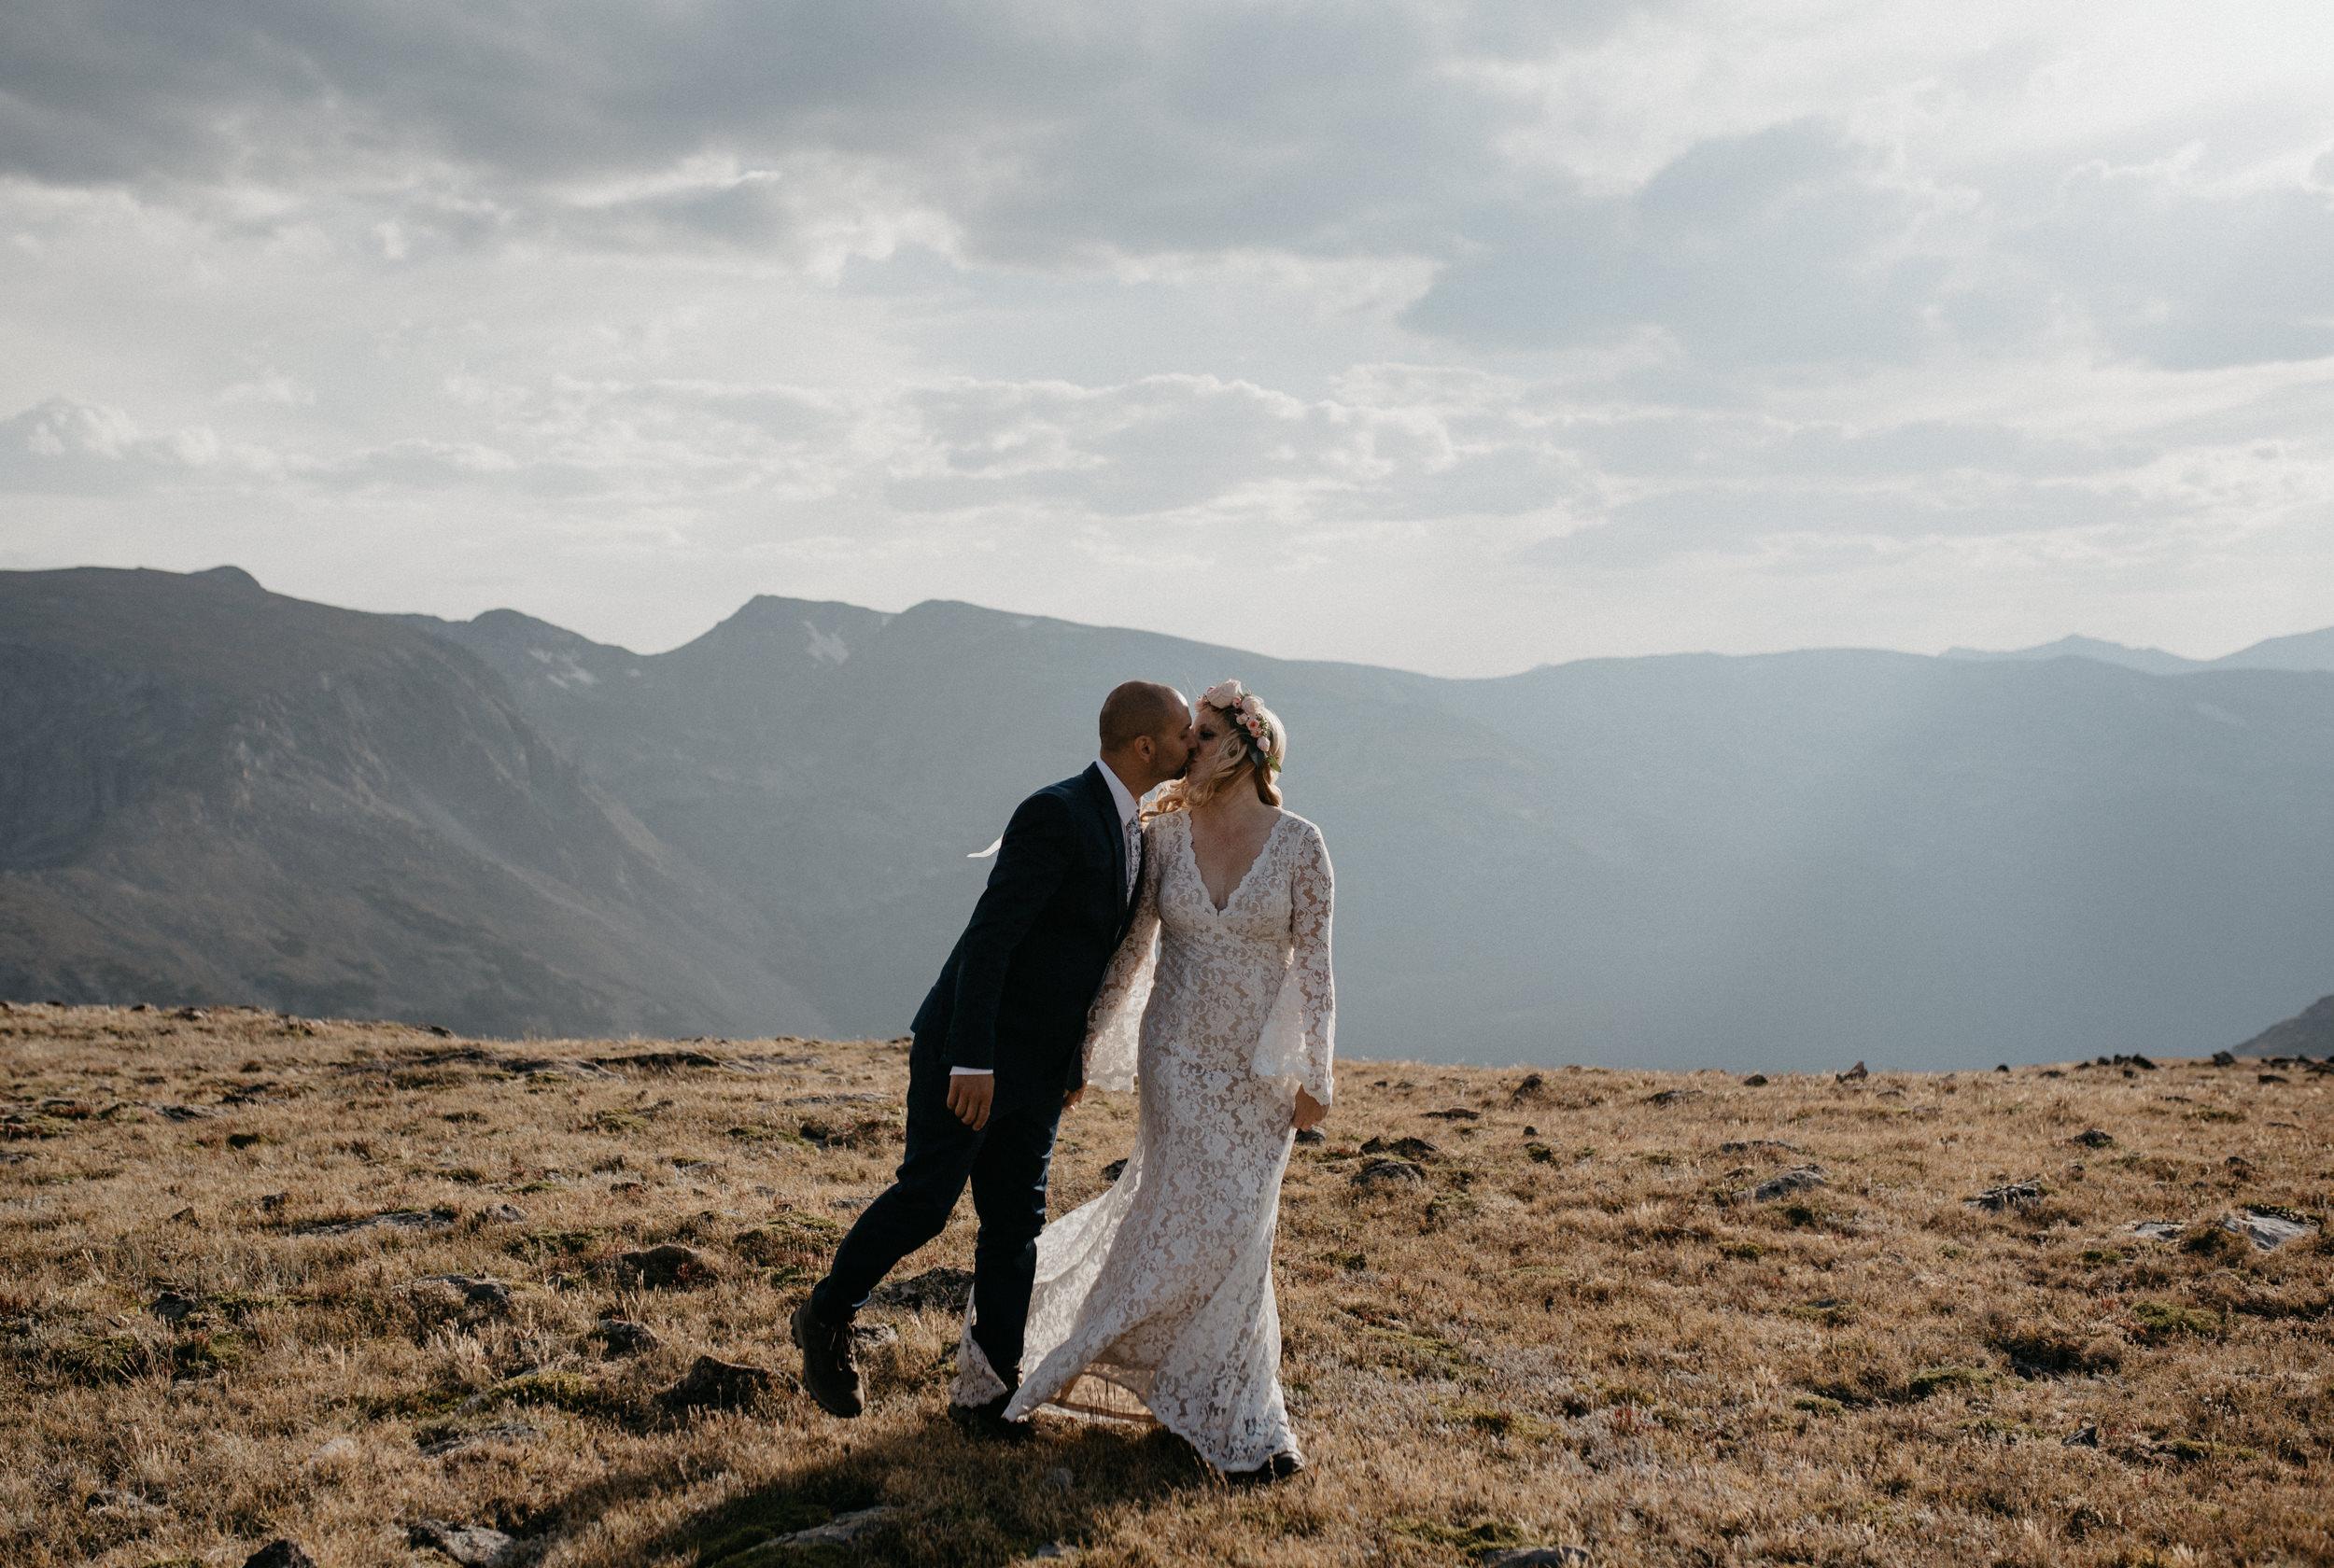 Mountain elopement photographer based in Colorado.